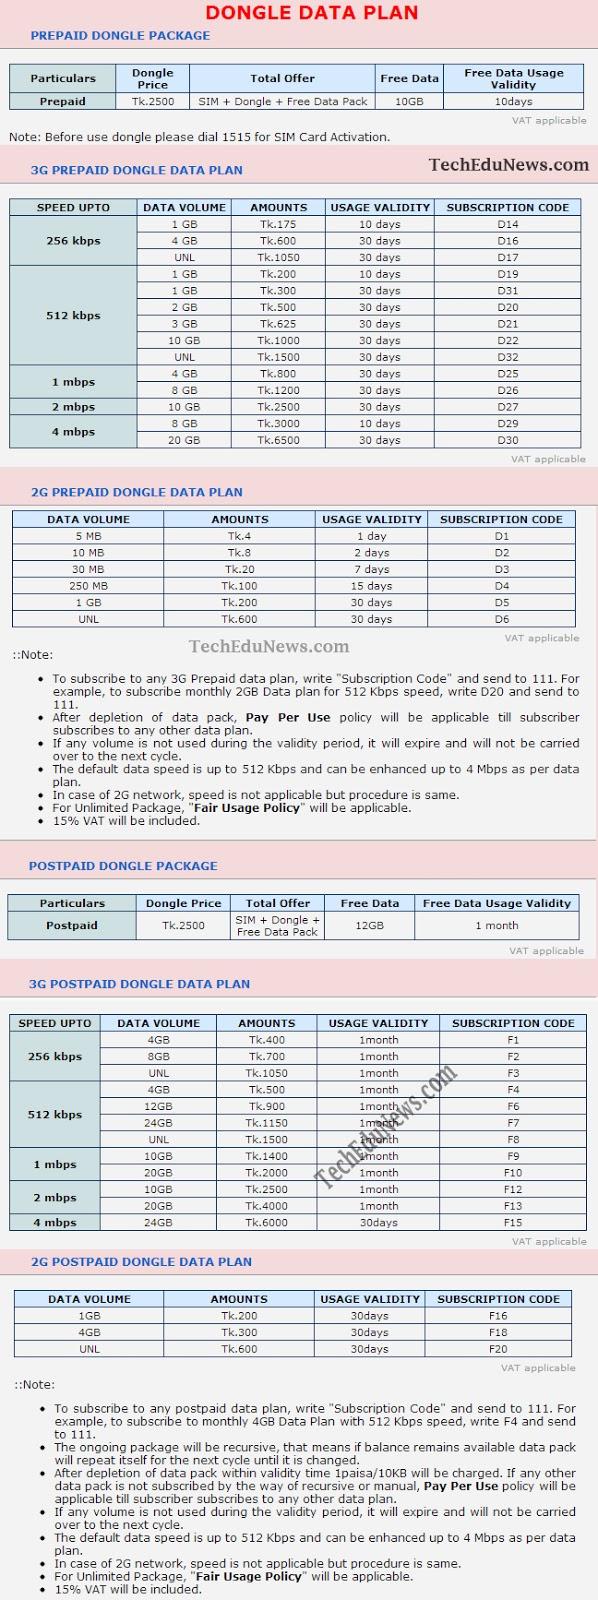 teletalk data plans Home about teletalk internet data plan 3g prepaid broadband promotional offer tariff/charges: data volume 1 gb 1 gb 2 gb 5 gb 10 gb 30 gb subscription fee tk 160 tk.